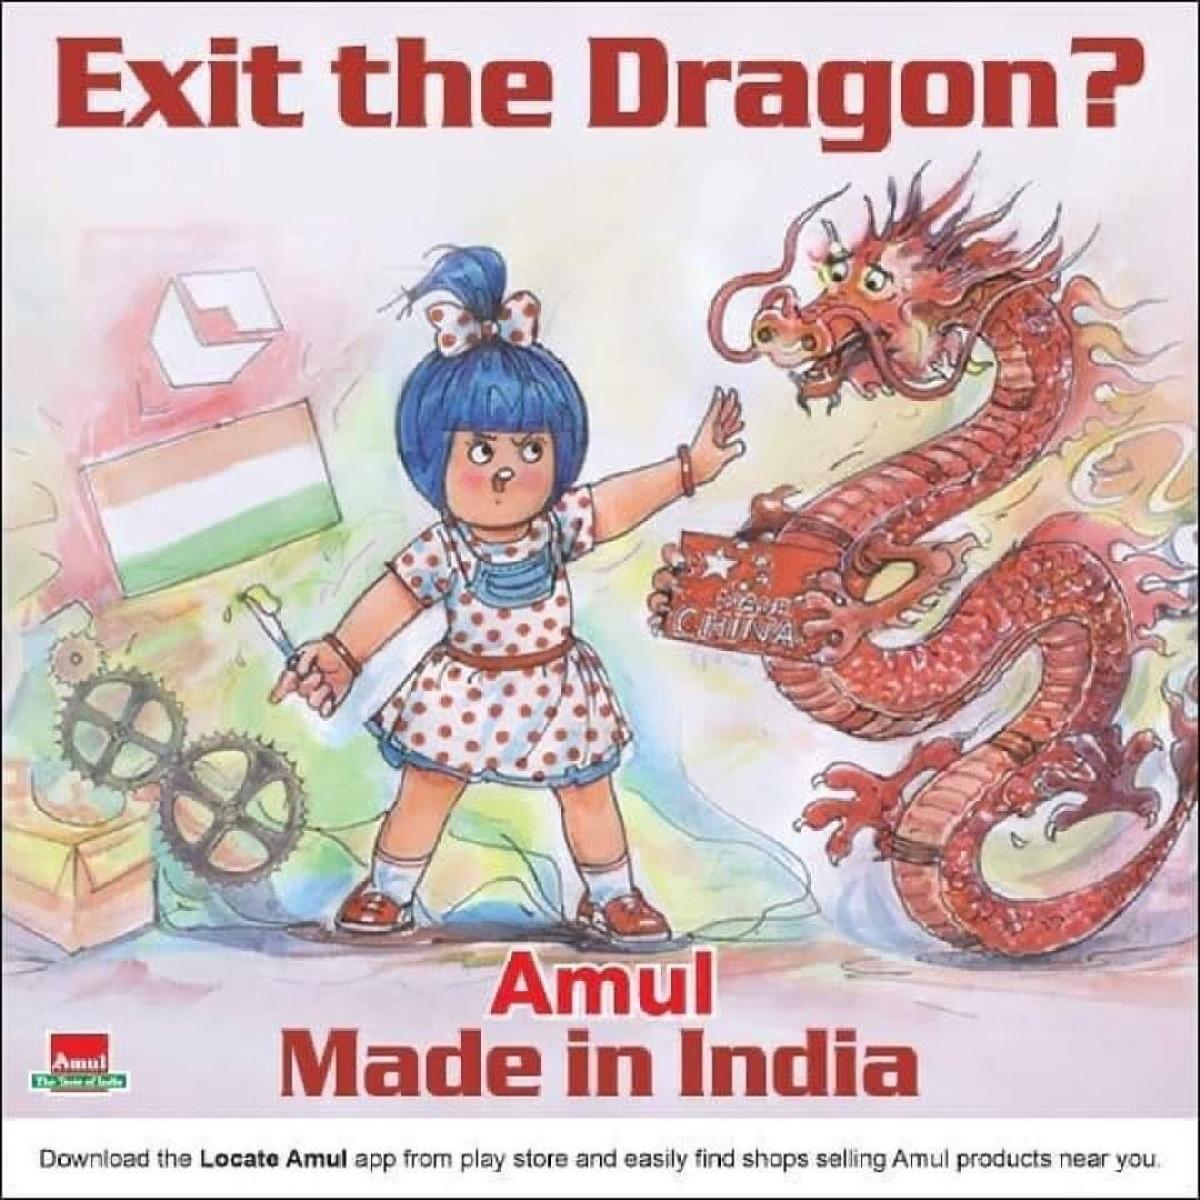 Amul Dragon Ad